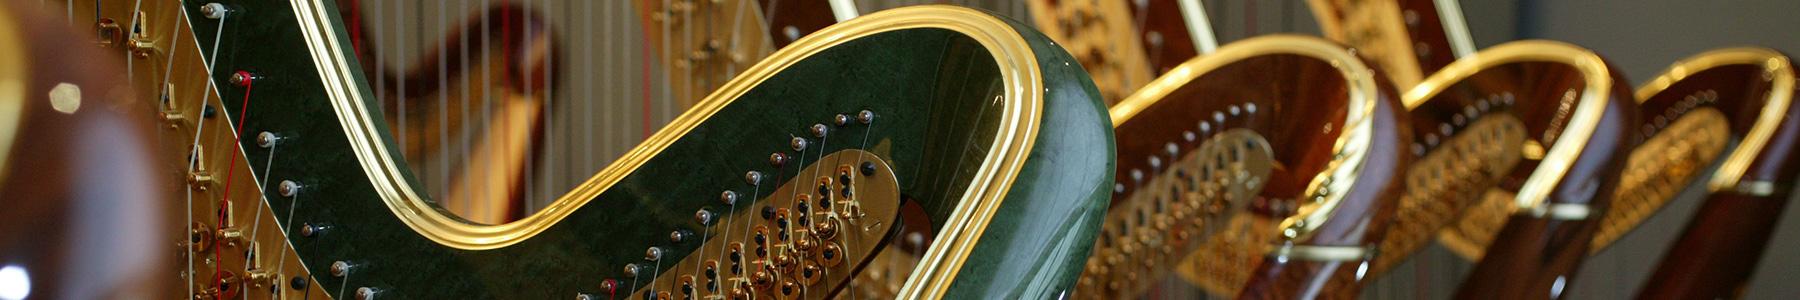 Contacts - Salvi Harps - Pedal Harps & Lever Harps